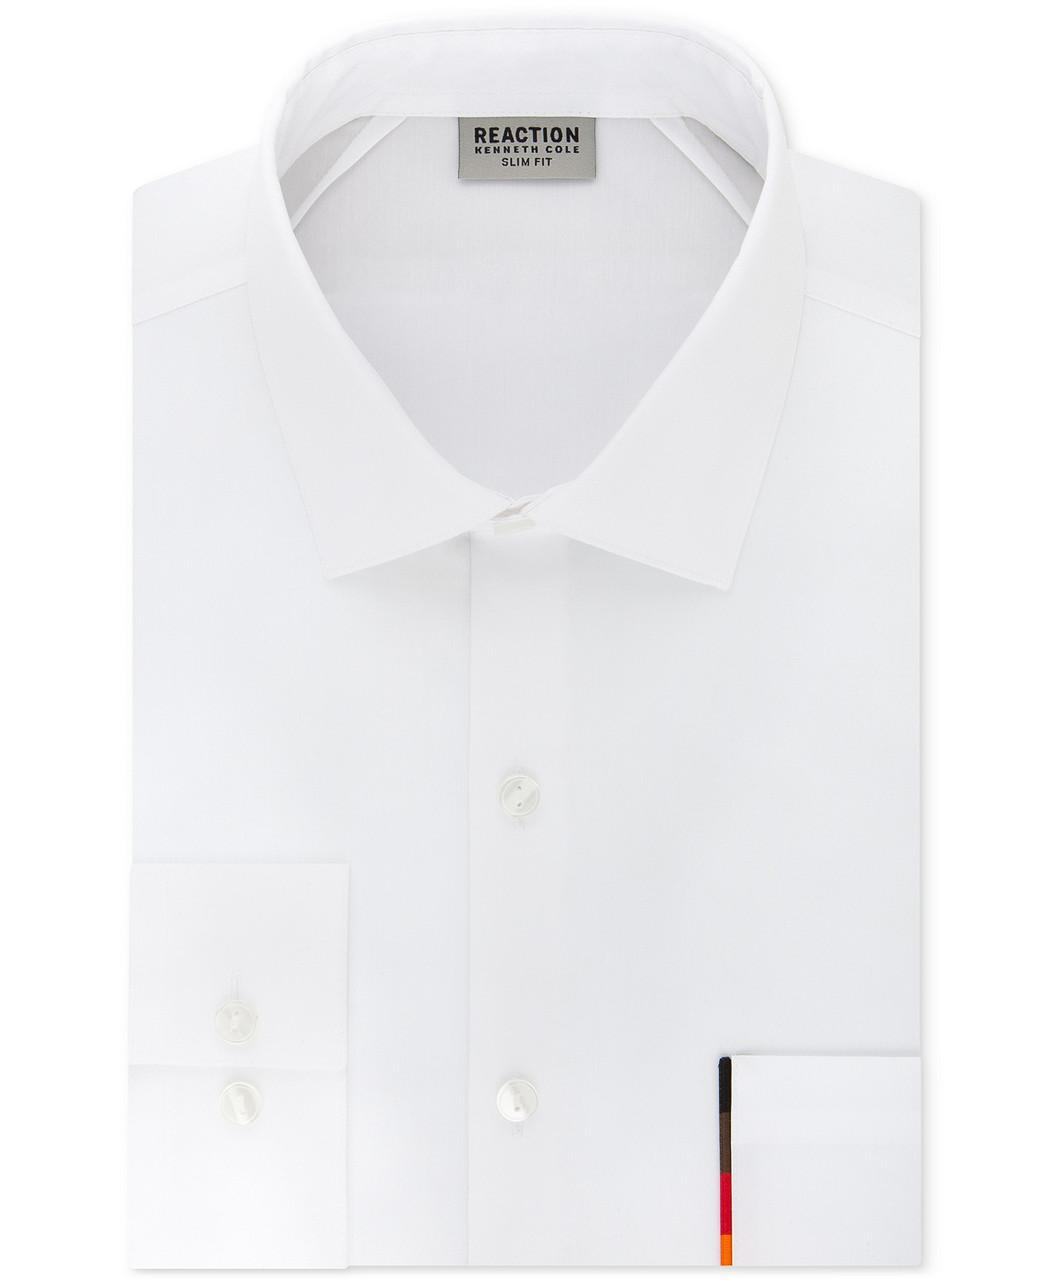 Kenneth Cole Reaction Мужская рубашка - Е2